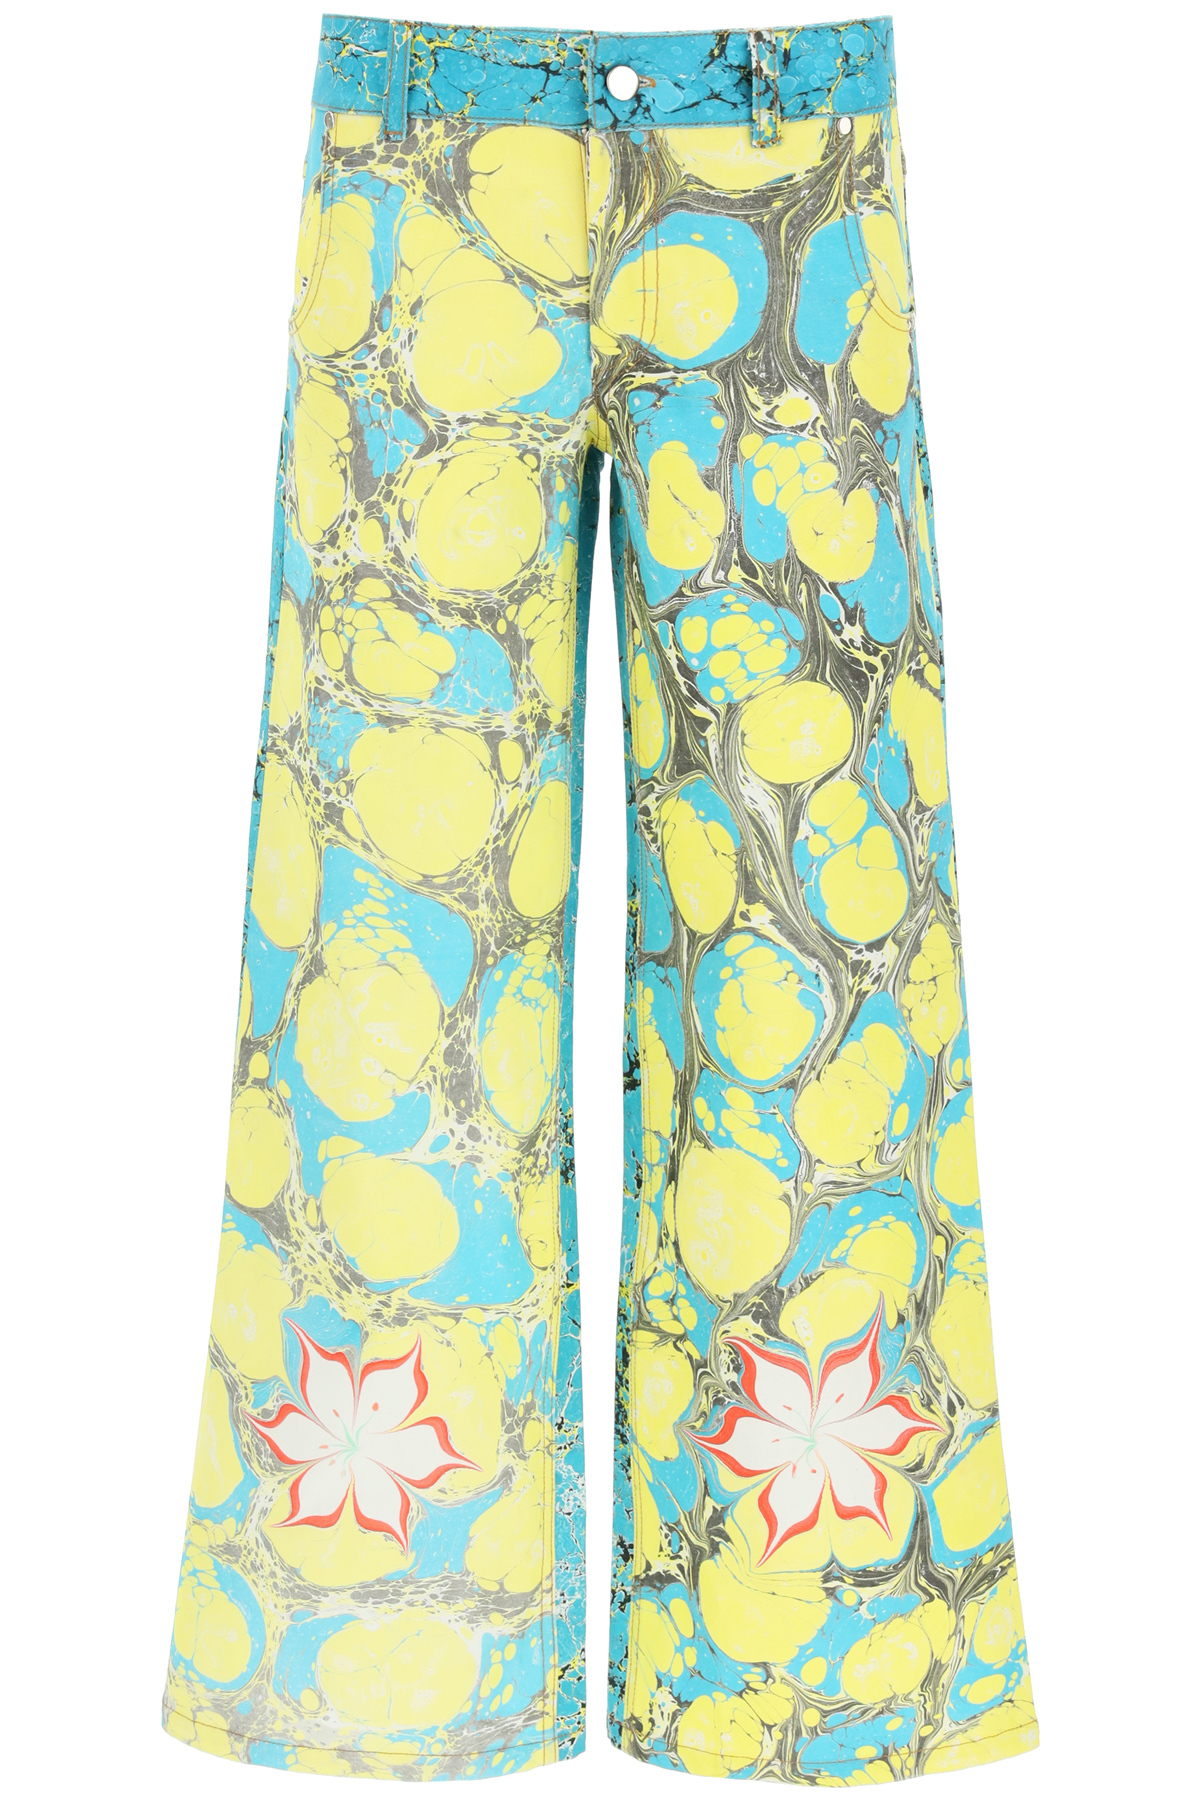 Chopova lowena pantaloni in denim multicolor